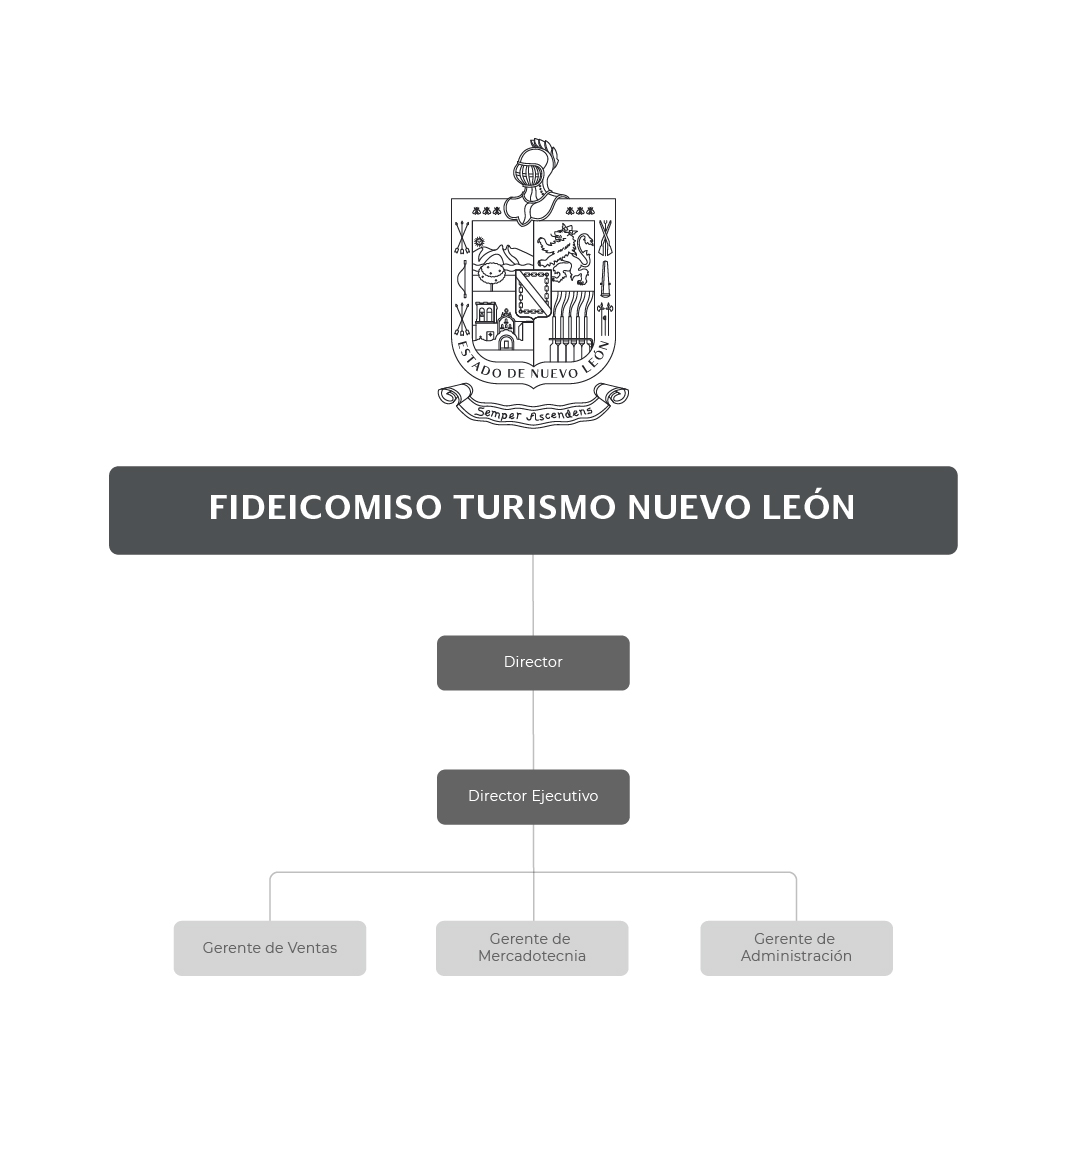 Organigrama del Fideicomiso Turismo Nuevo León